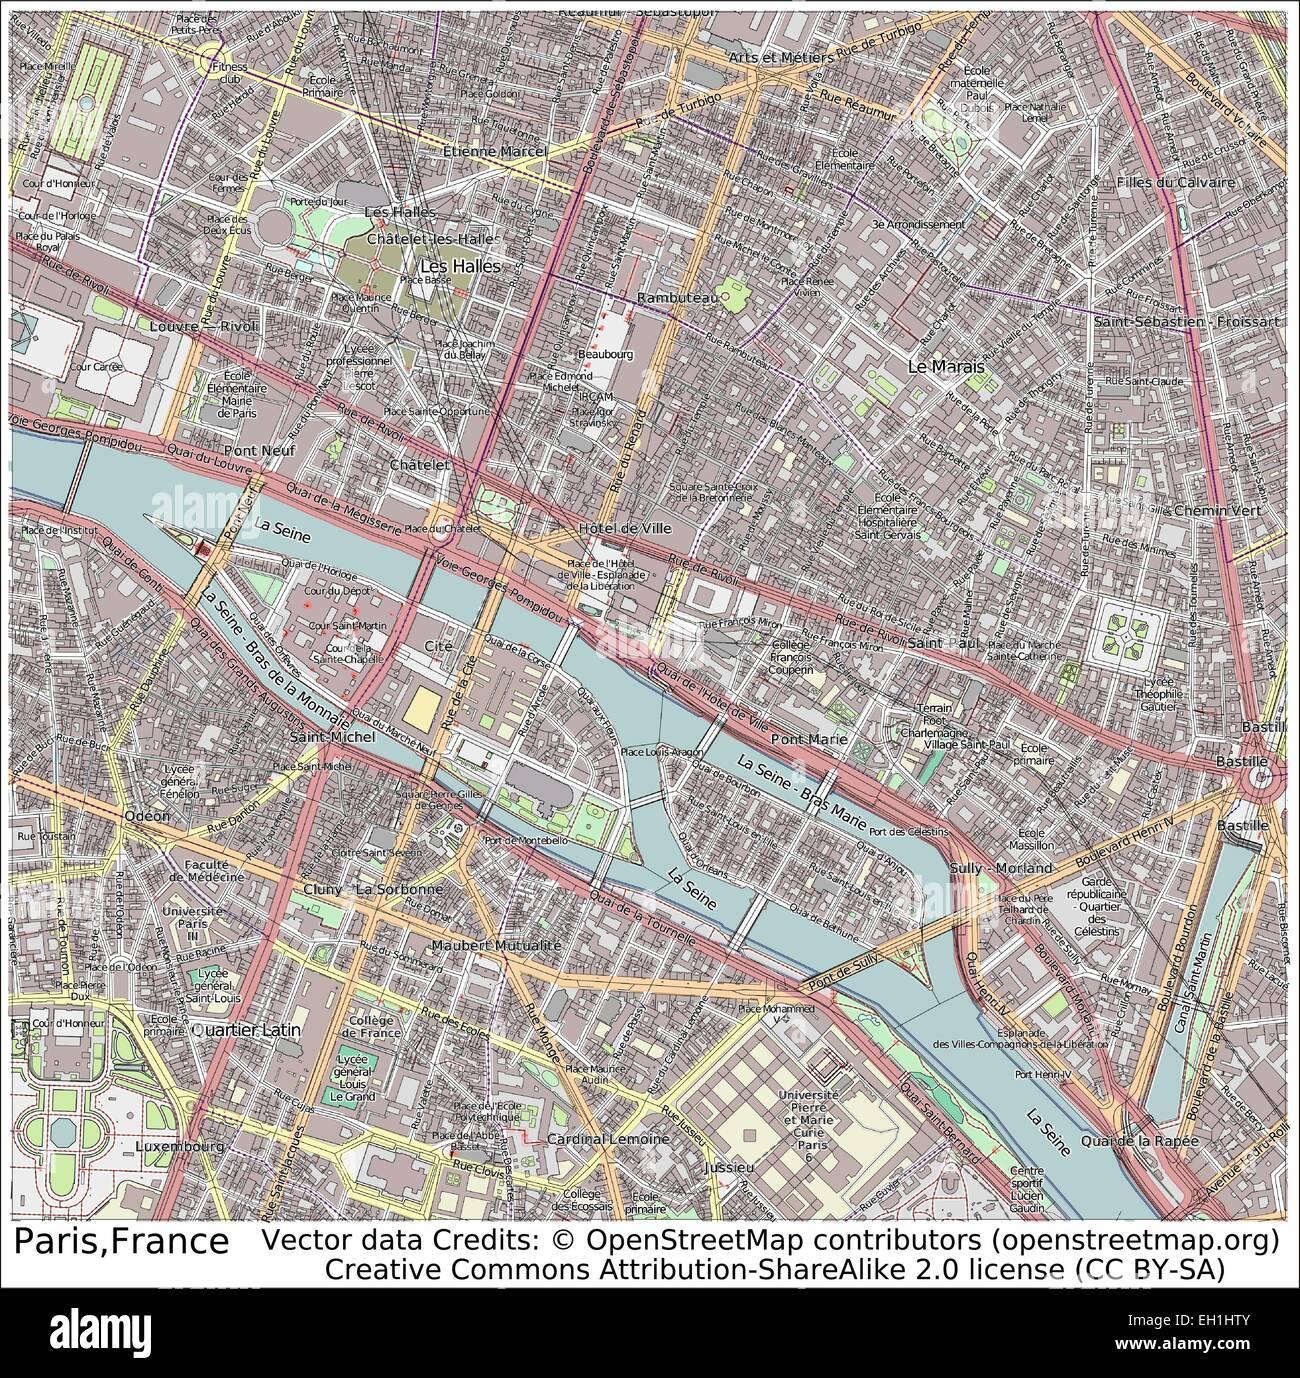 Paris France city map Stock Vector Art & Illustration, Vector Image on